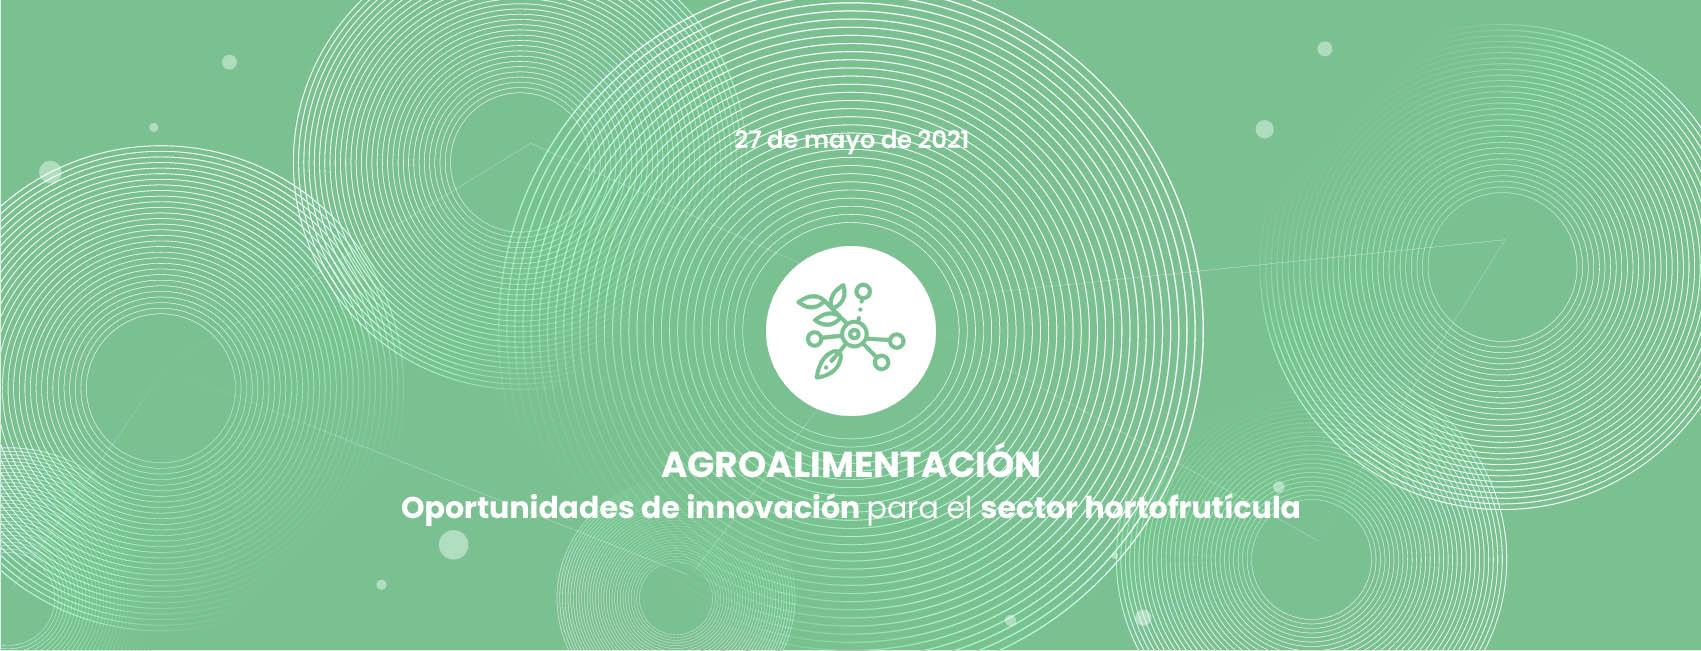 Innotransfer: Oportunidades de innovación Sector Hortofrutícola